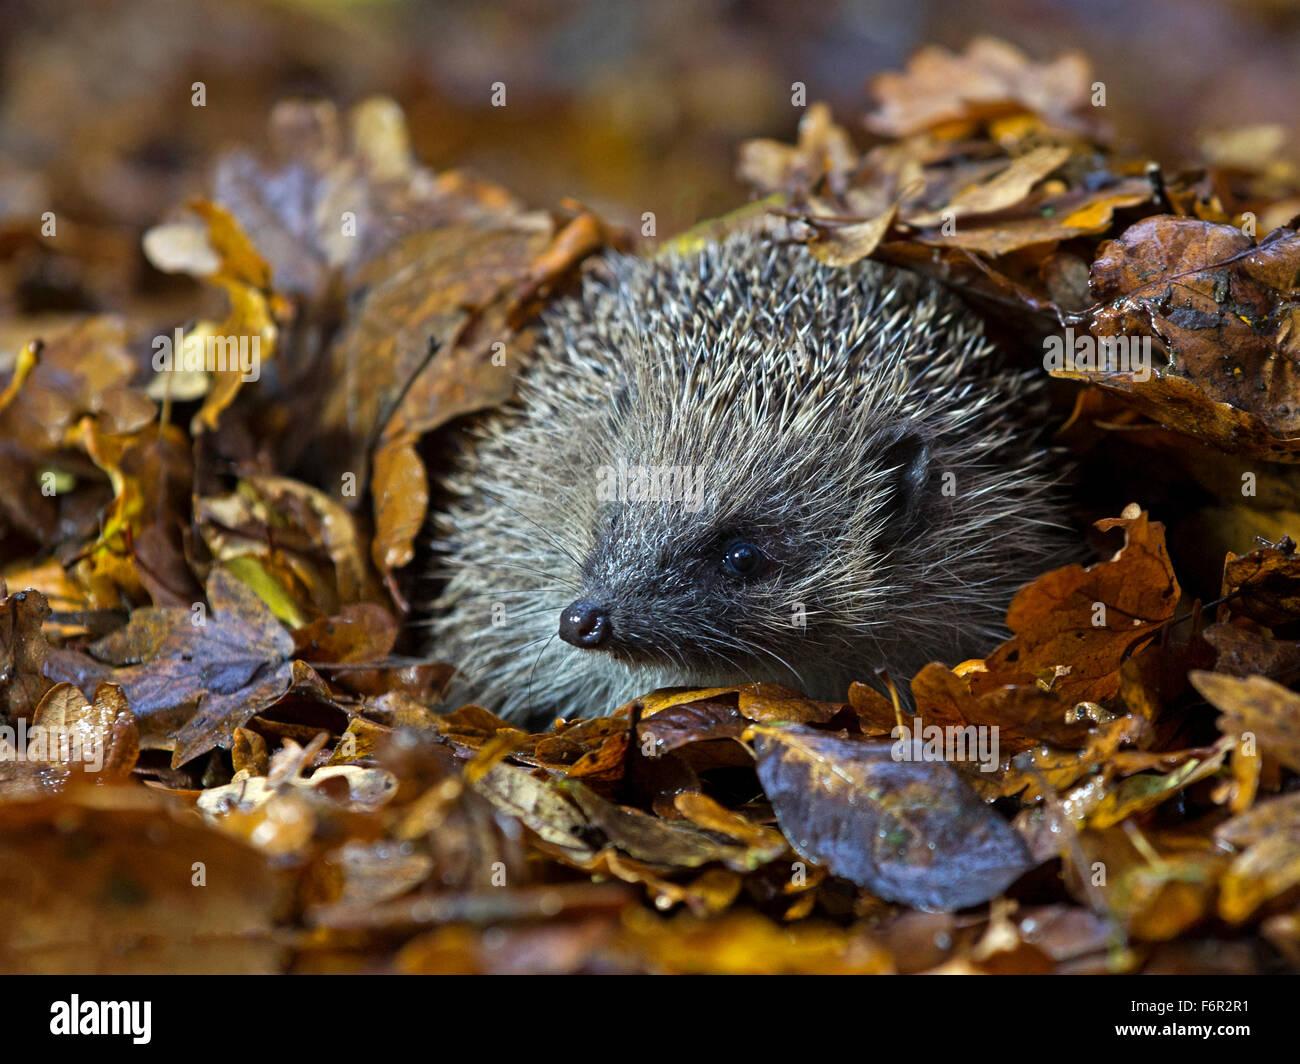 European hedgehog in Autumn leaves - Stock Image